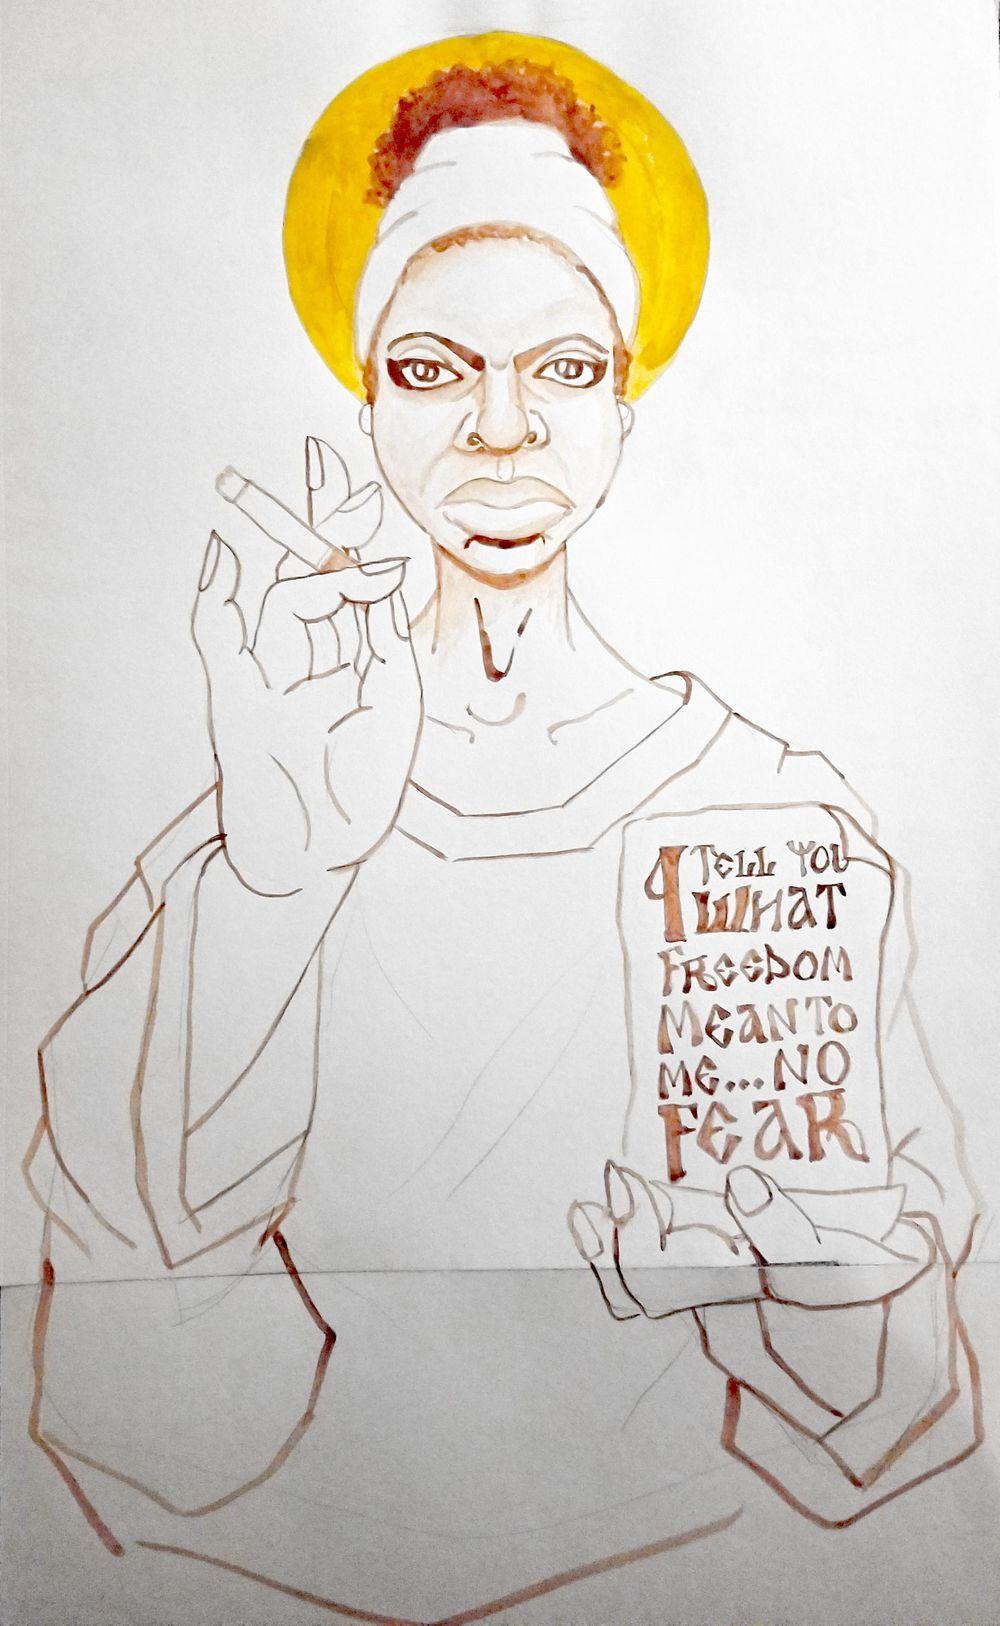 Ms. Nina Simone - image 4 - student project